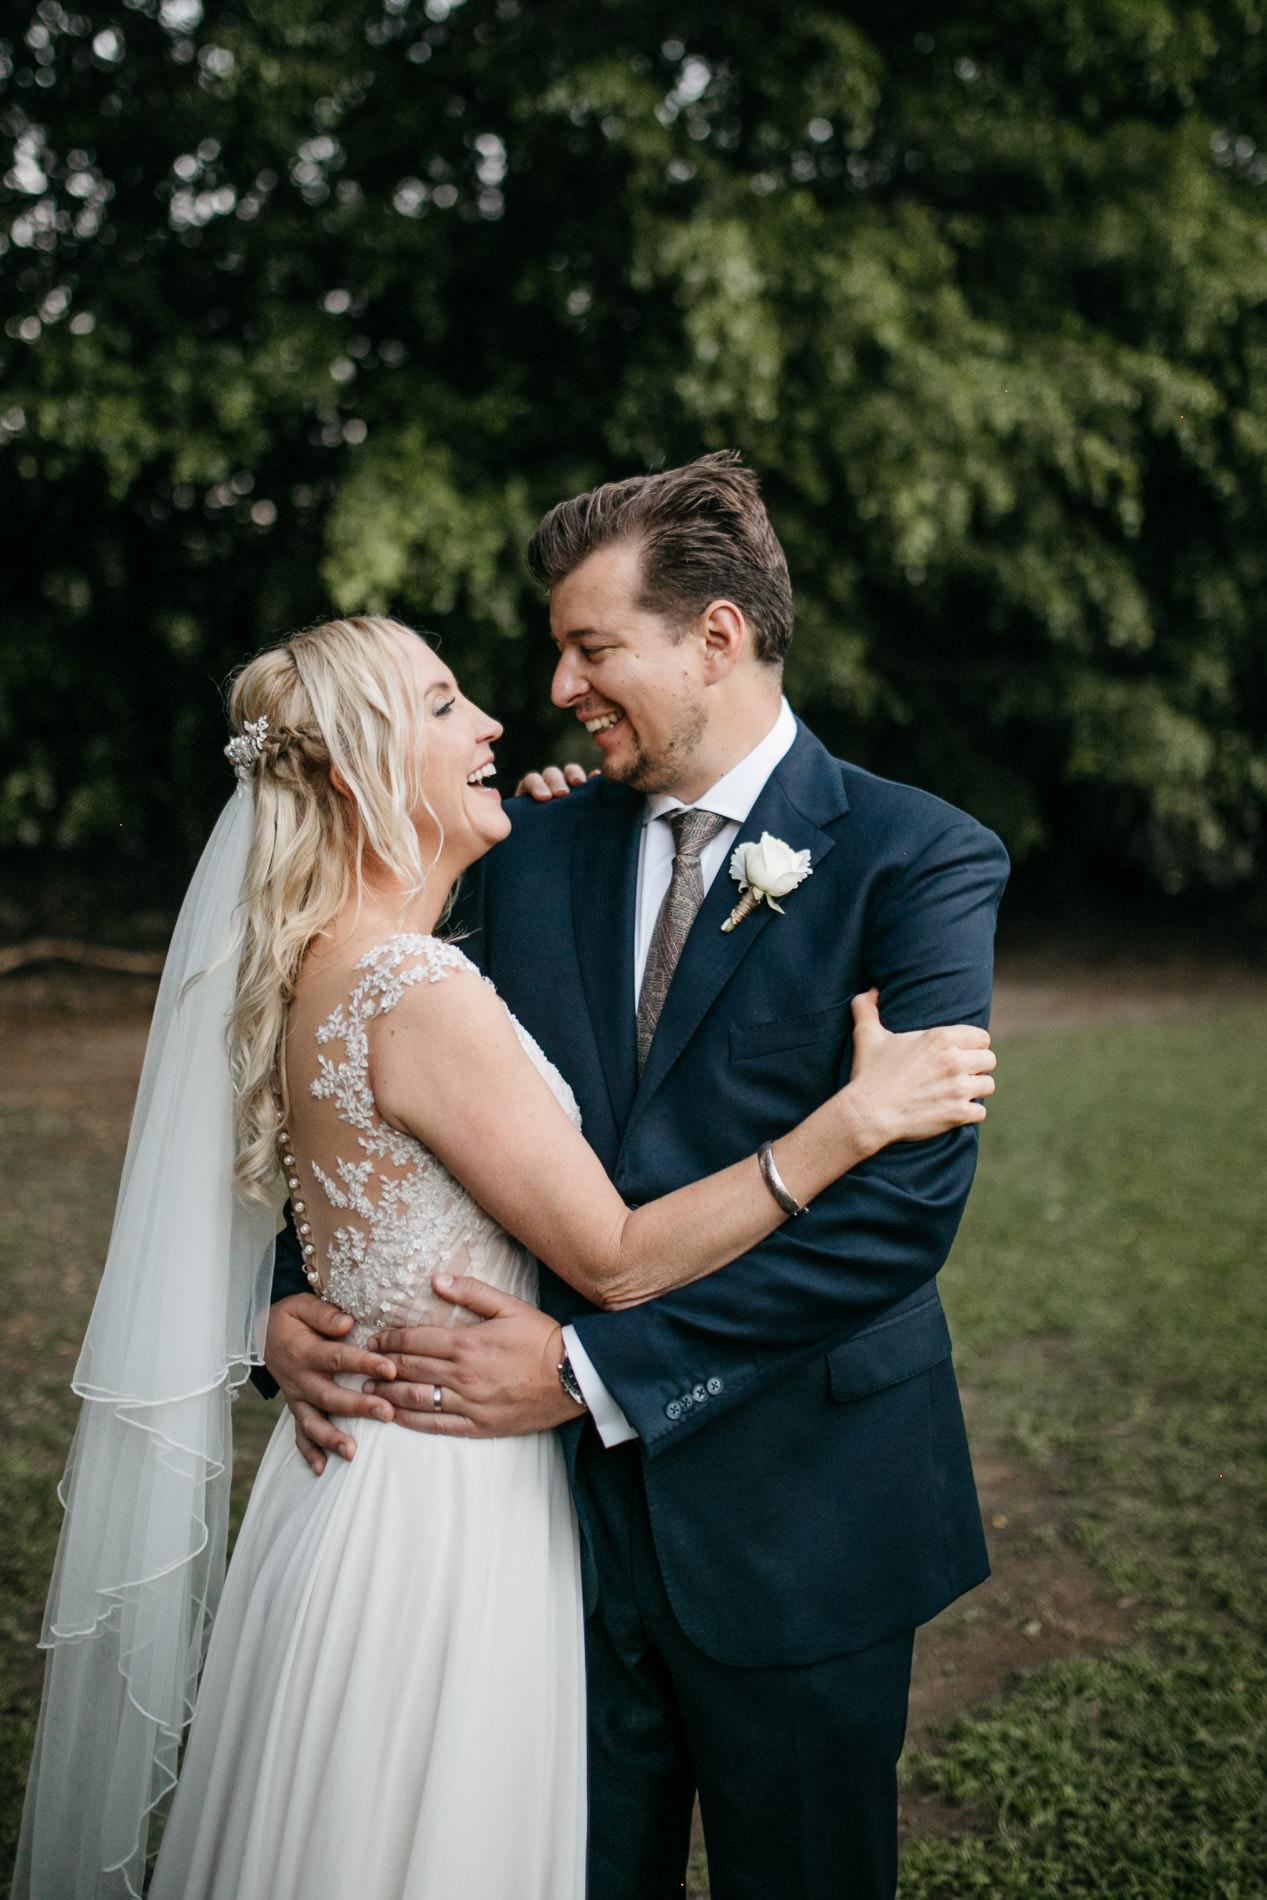 True North Photography_Boomerang Farm_Stacey and Isaac_Gold Coast Wedding_Barm Wedding_Hinterland Wedding-164.jpg